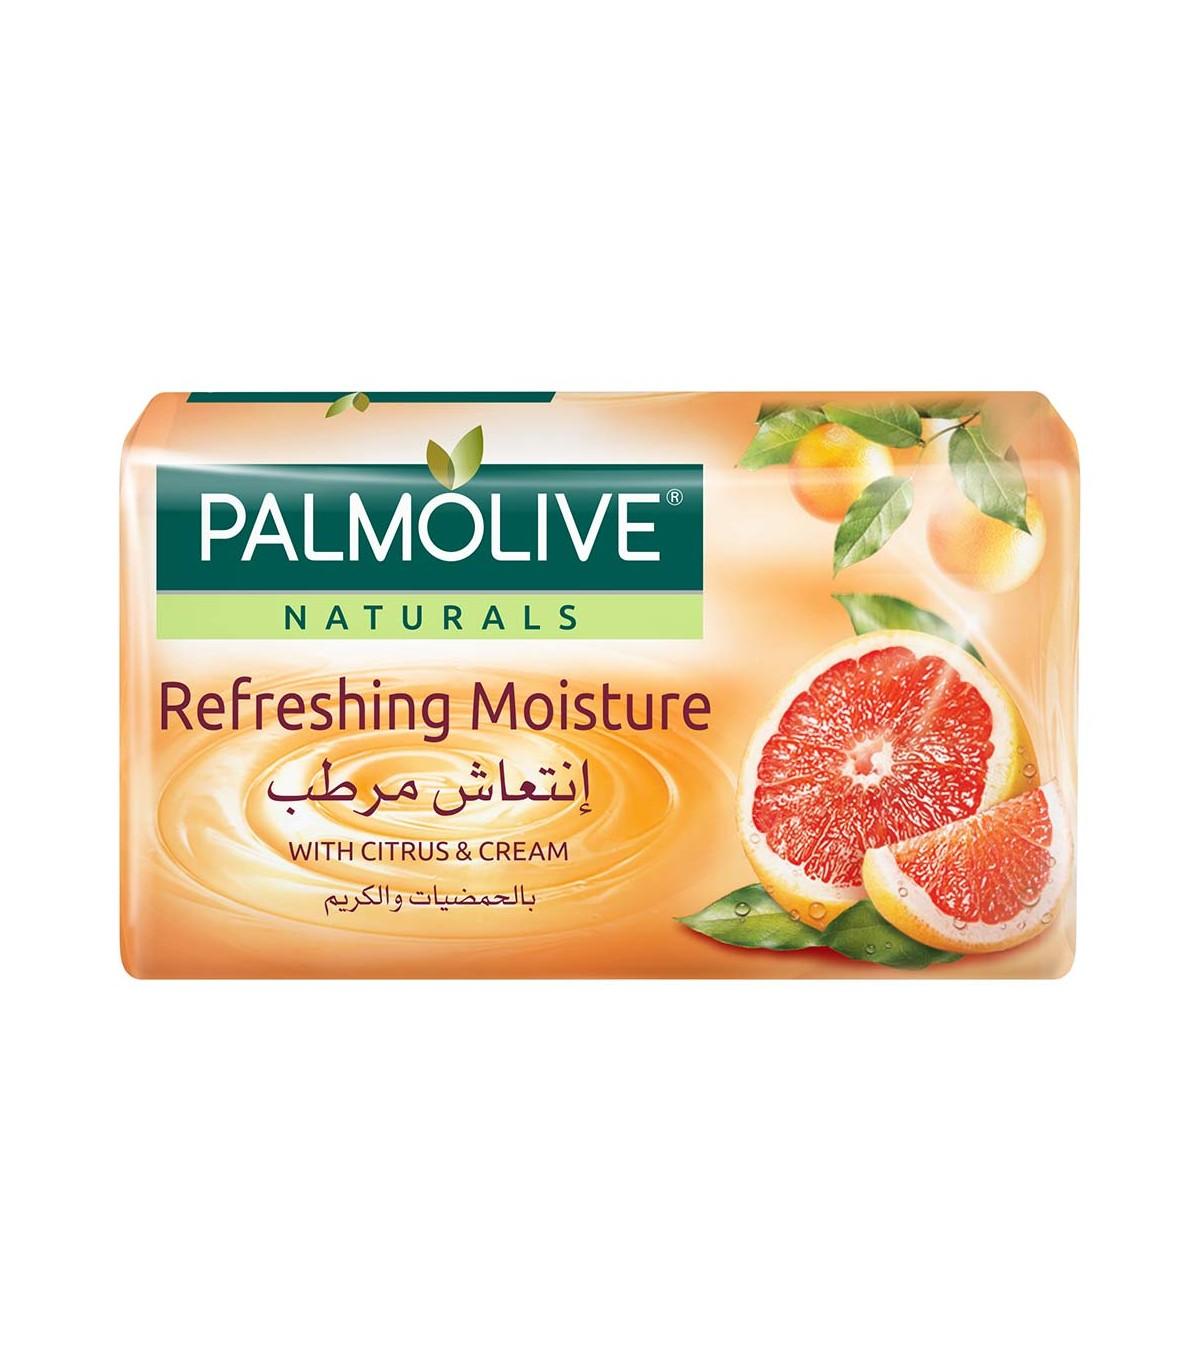 Palmolive صابون خامه و مرکبات 170 گرمی پالمولایو